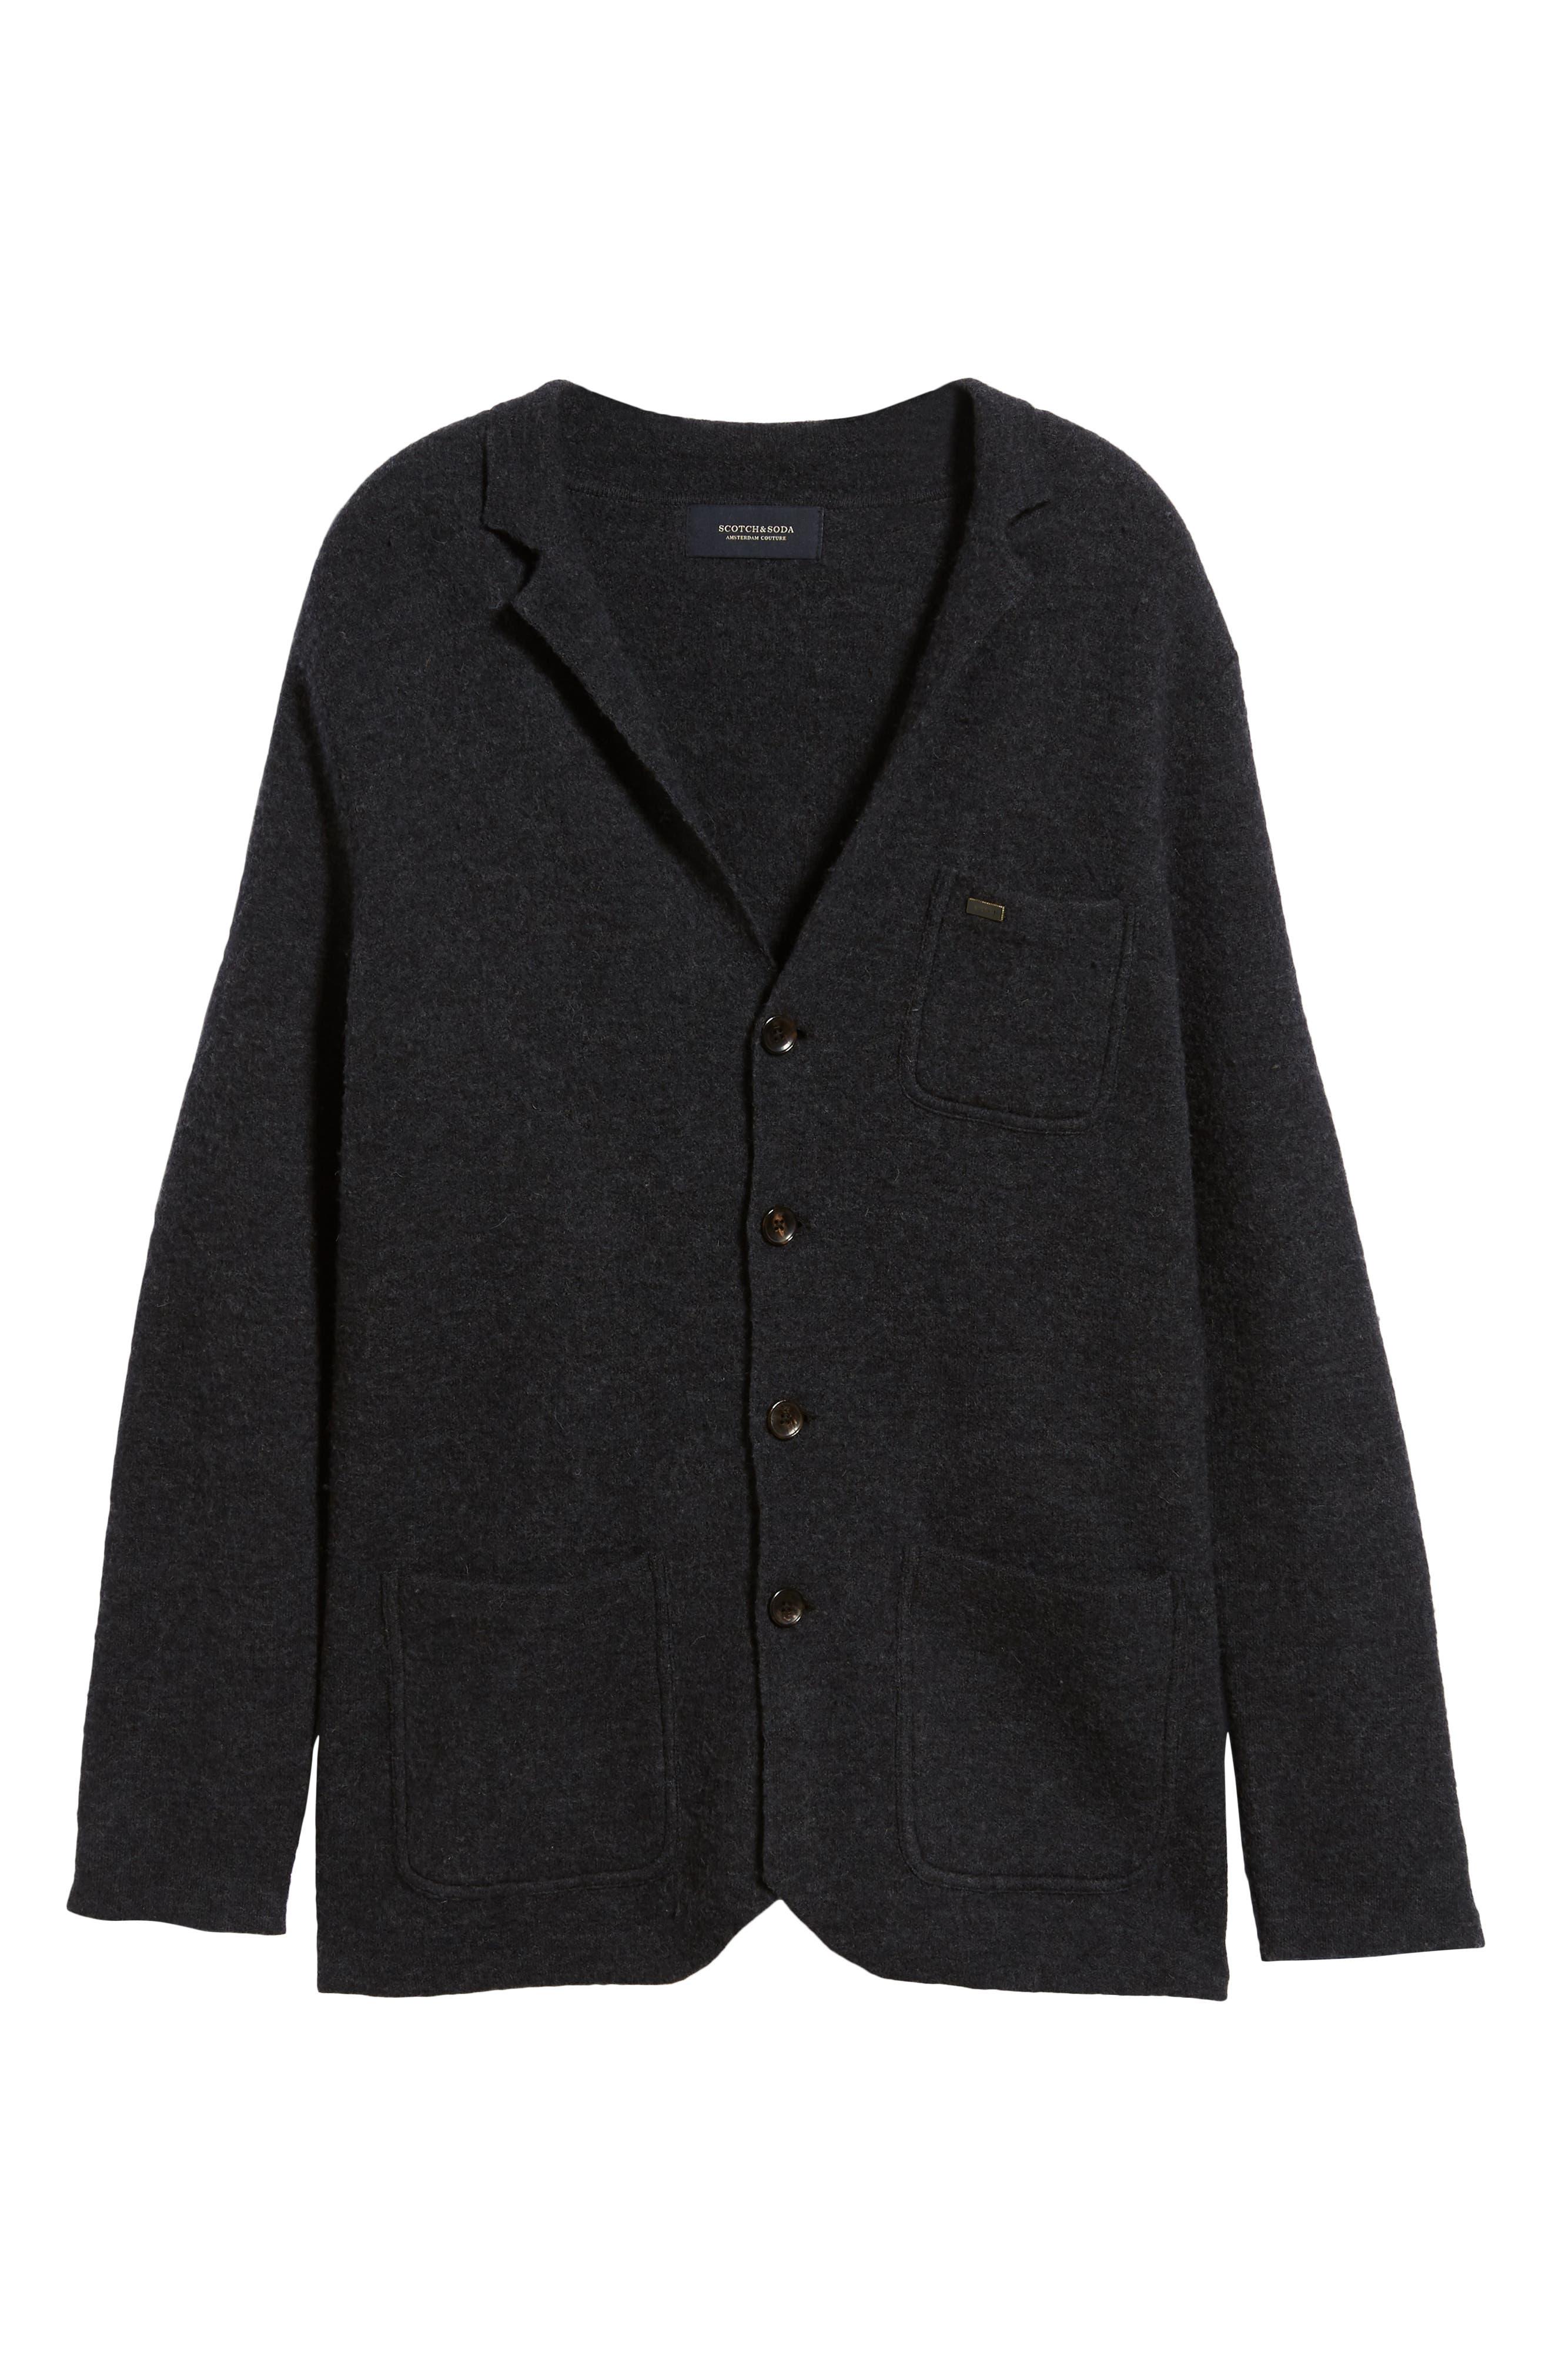 Boiled Wool Blazer,                             Alternate thumbnail 6, color,                             CHARCOAL MELANGE